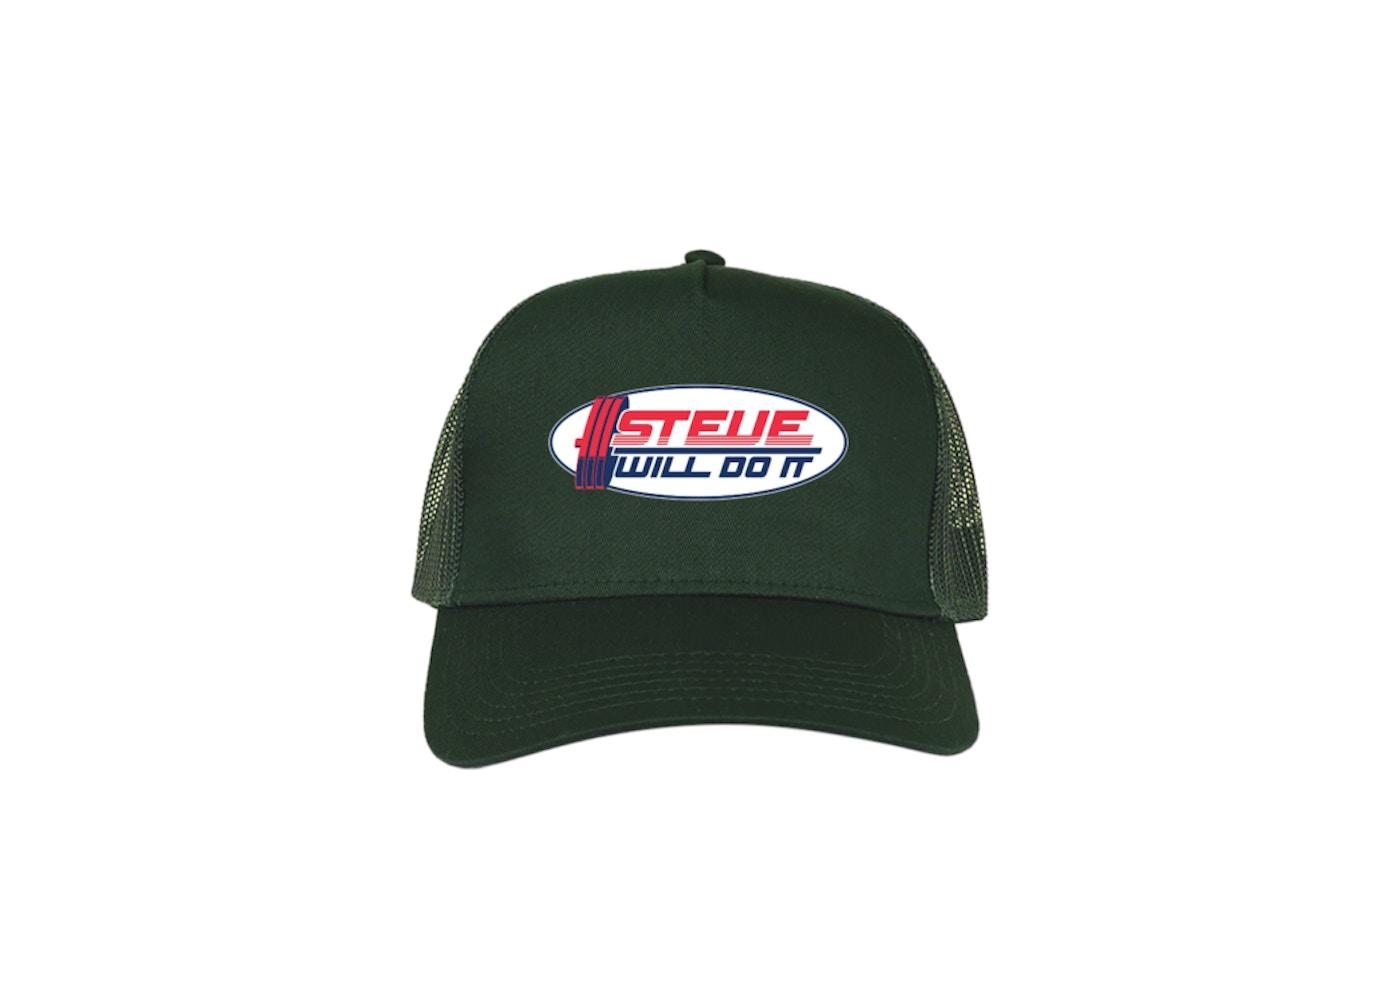 Full Send Stevewilldoit Power Hat Dark Green Fw20 Buy and sell authentic full send streetwear on stockx including the full send stevewilldoit bowtie tee white from fw20. stevewilldoit power hat dark green fw20